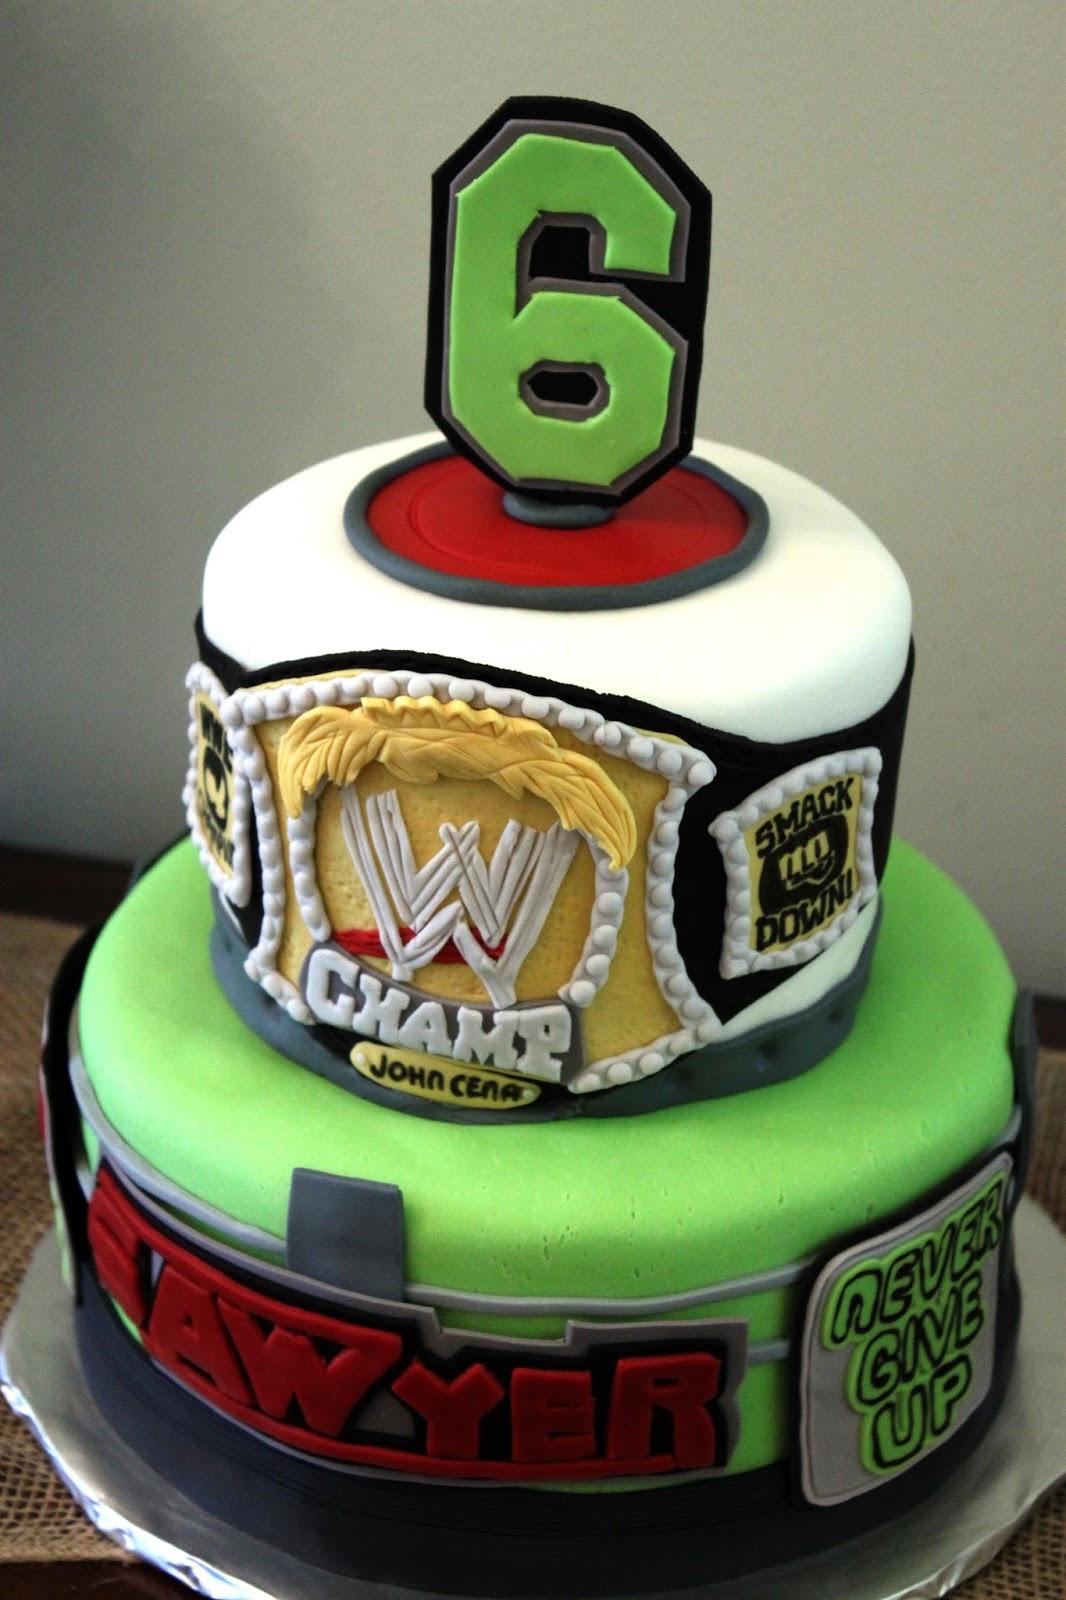 Layers Of Love John Cena Cake